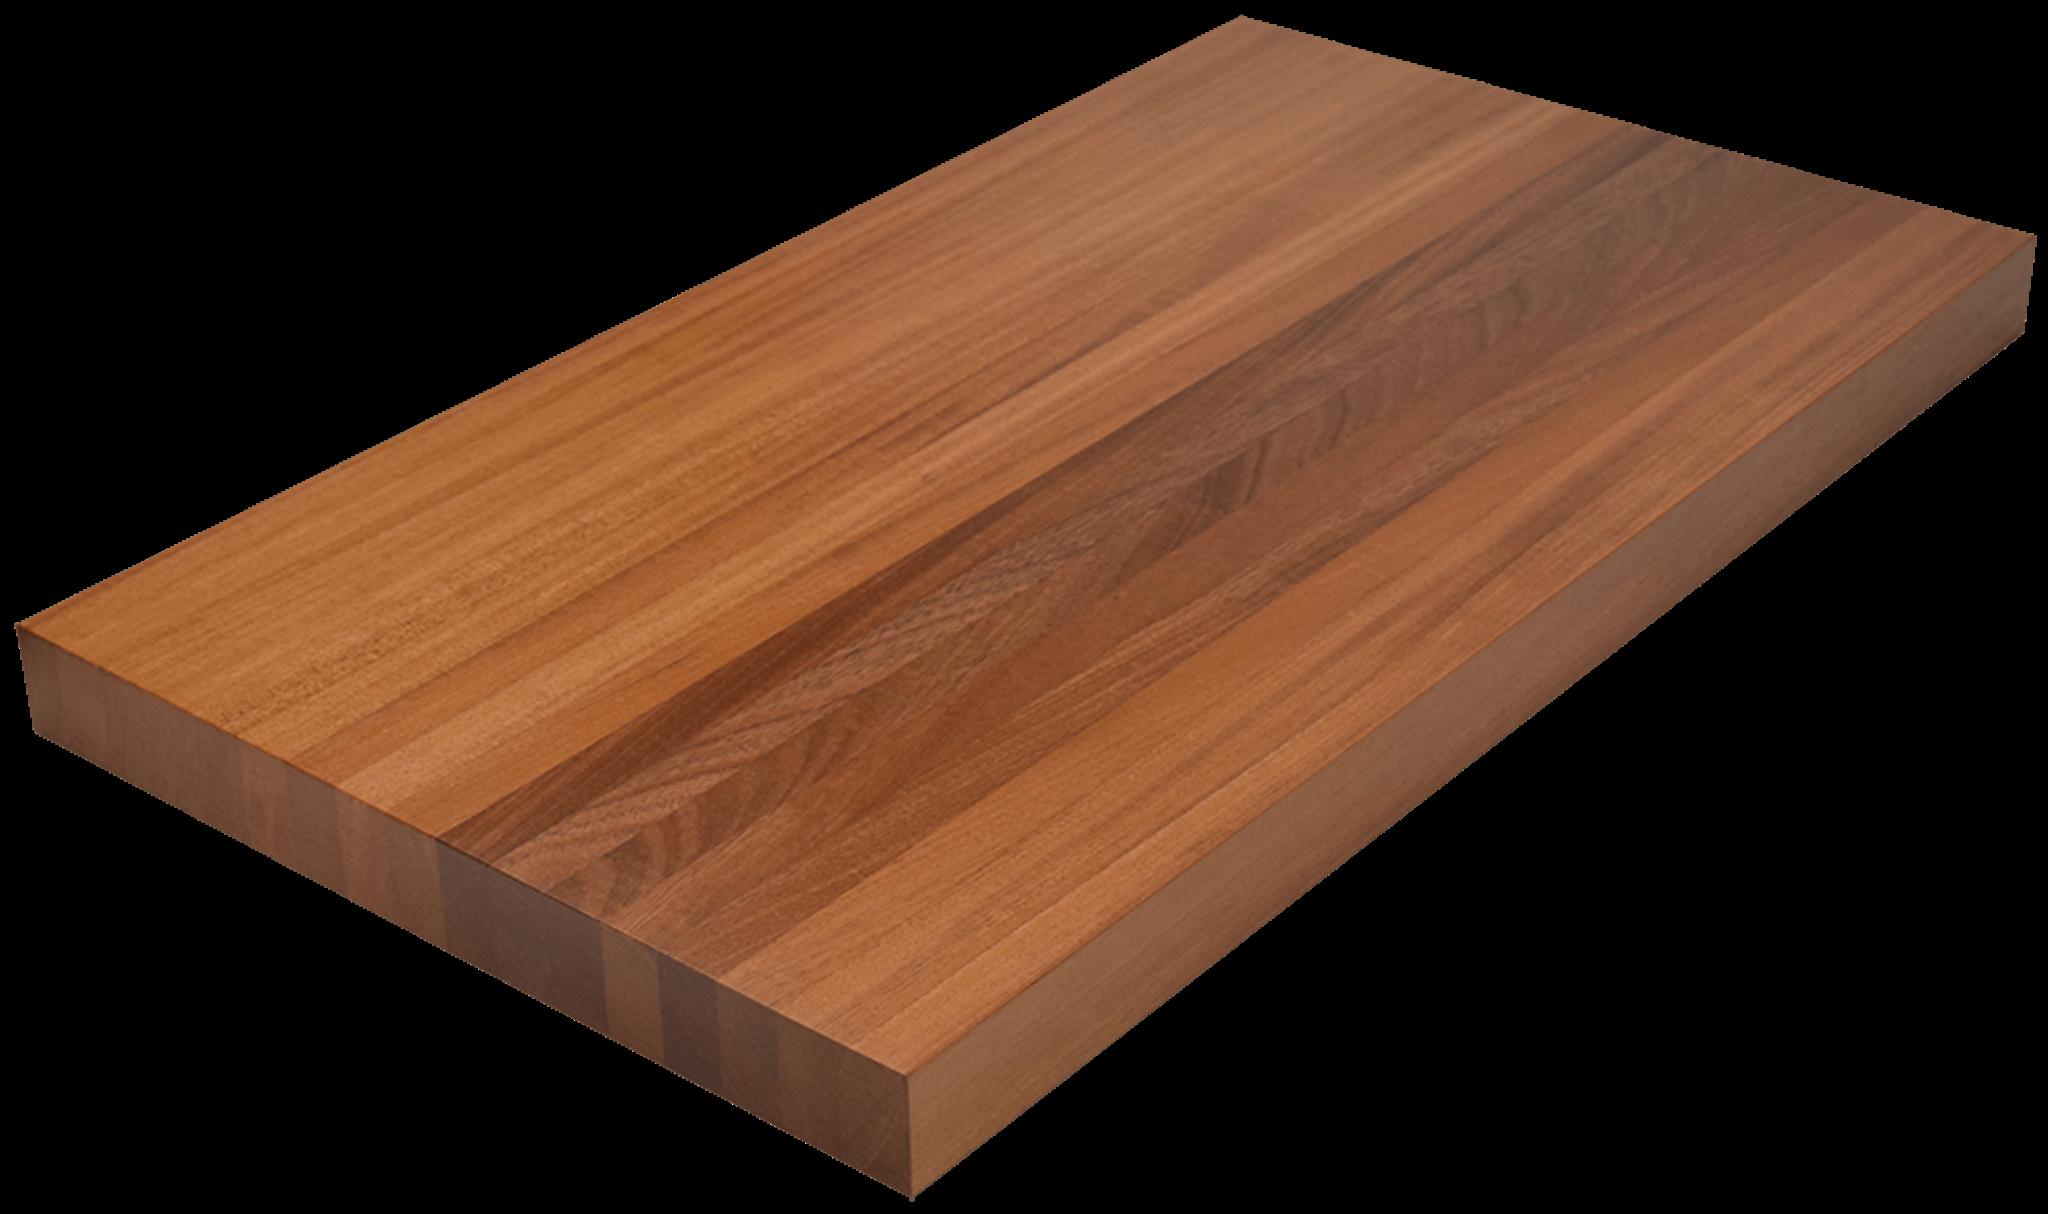 african mahogany edge grain butcher block countertop hardwood lumber company. Black Bedroom Furniture Sets. Home Design Ideas